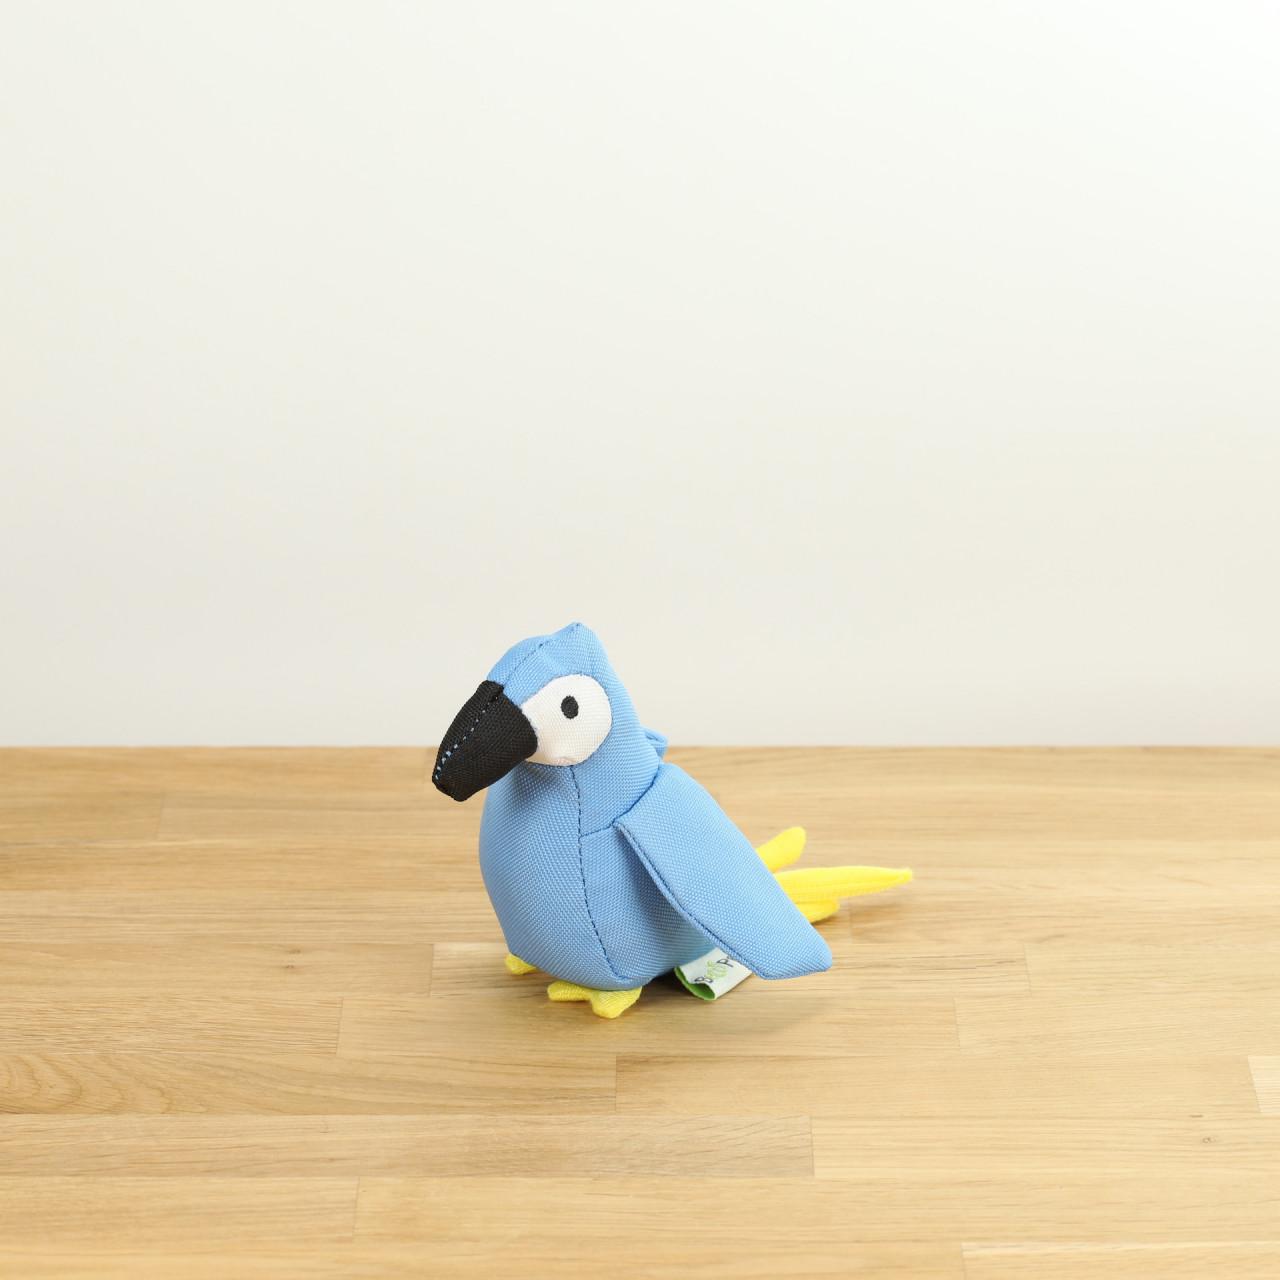 Hundespielzeug Lucy, der Papagei